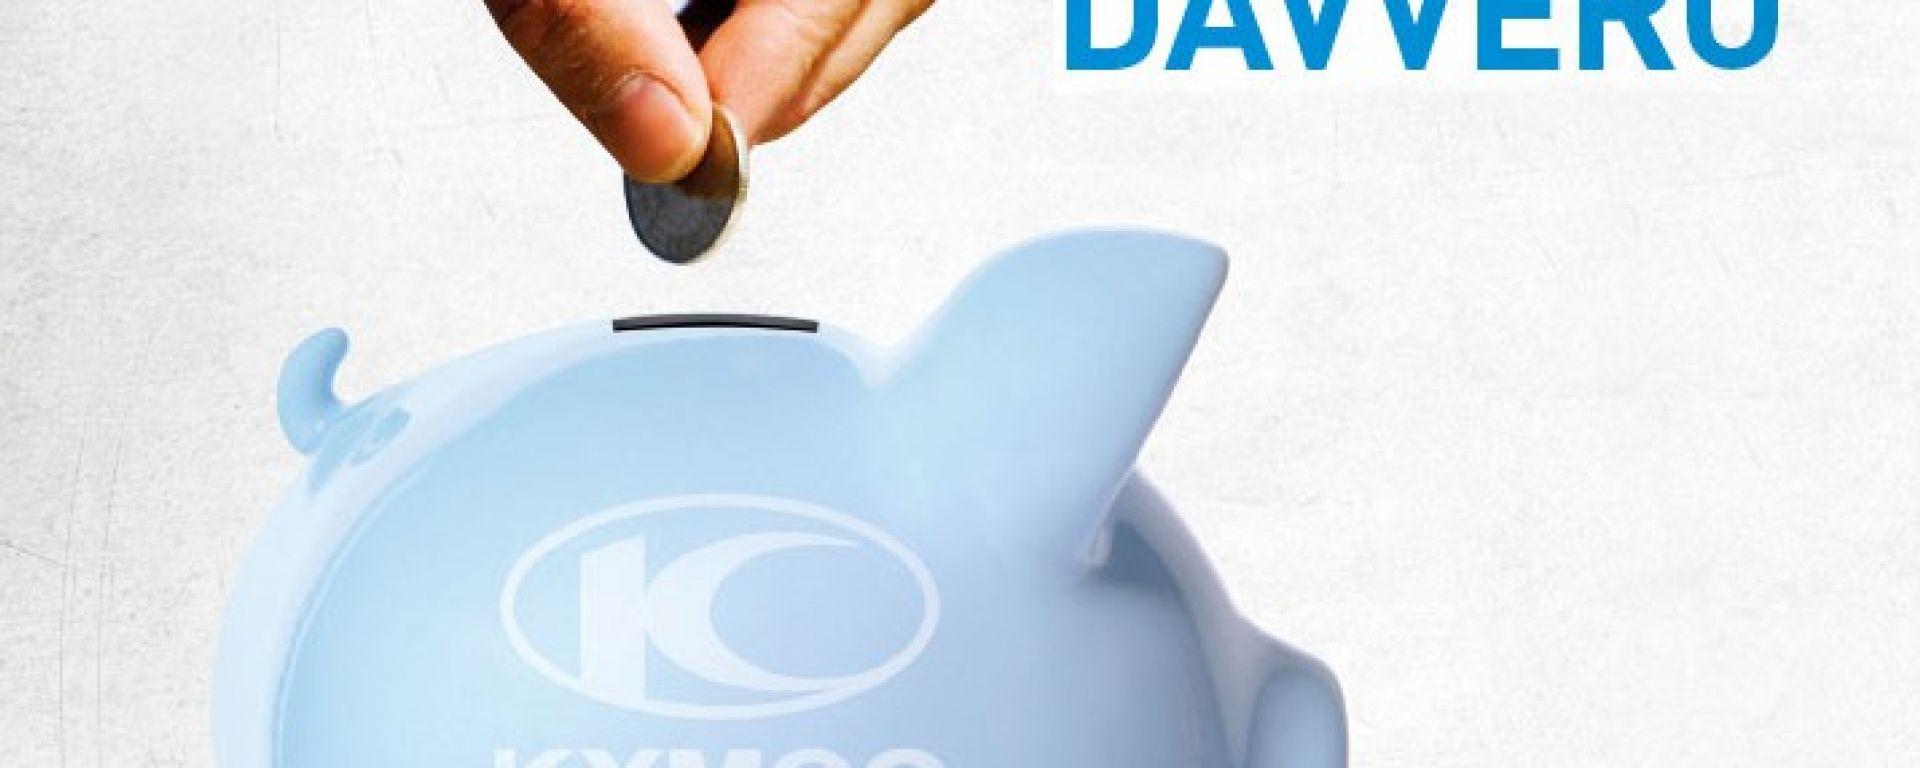 Kymco: Economy per davvero